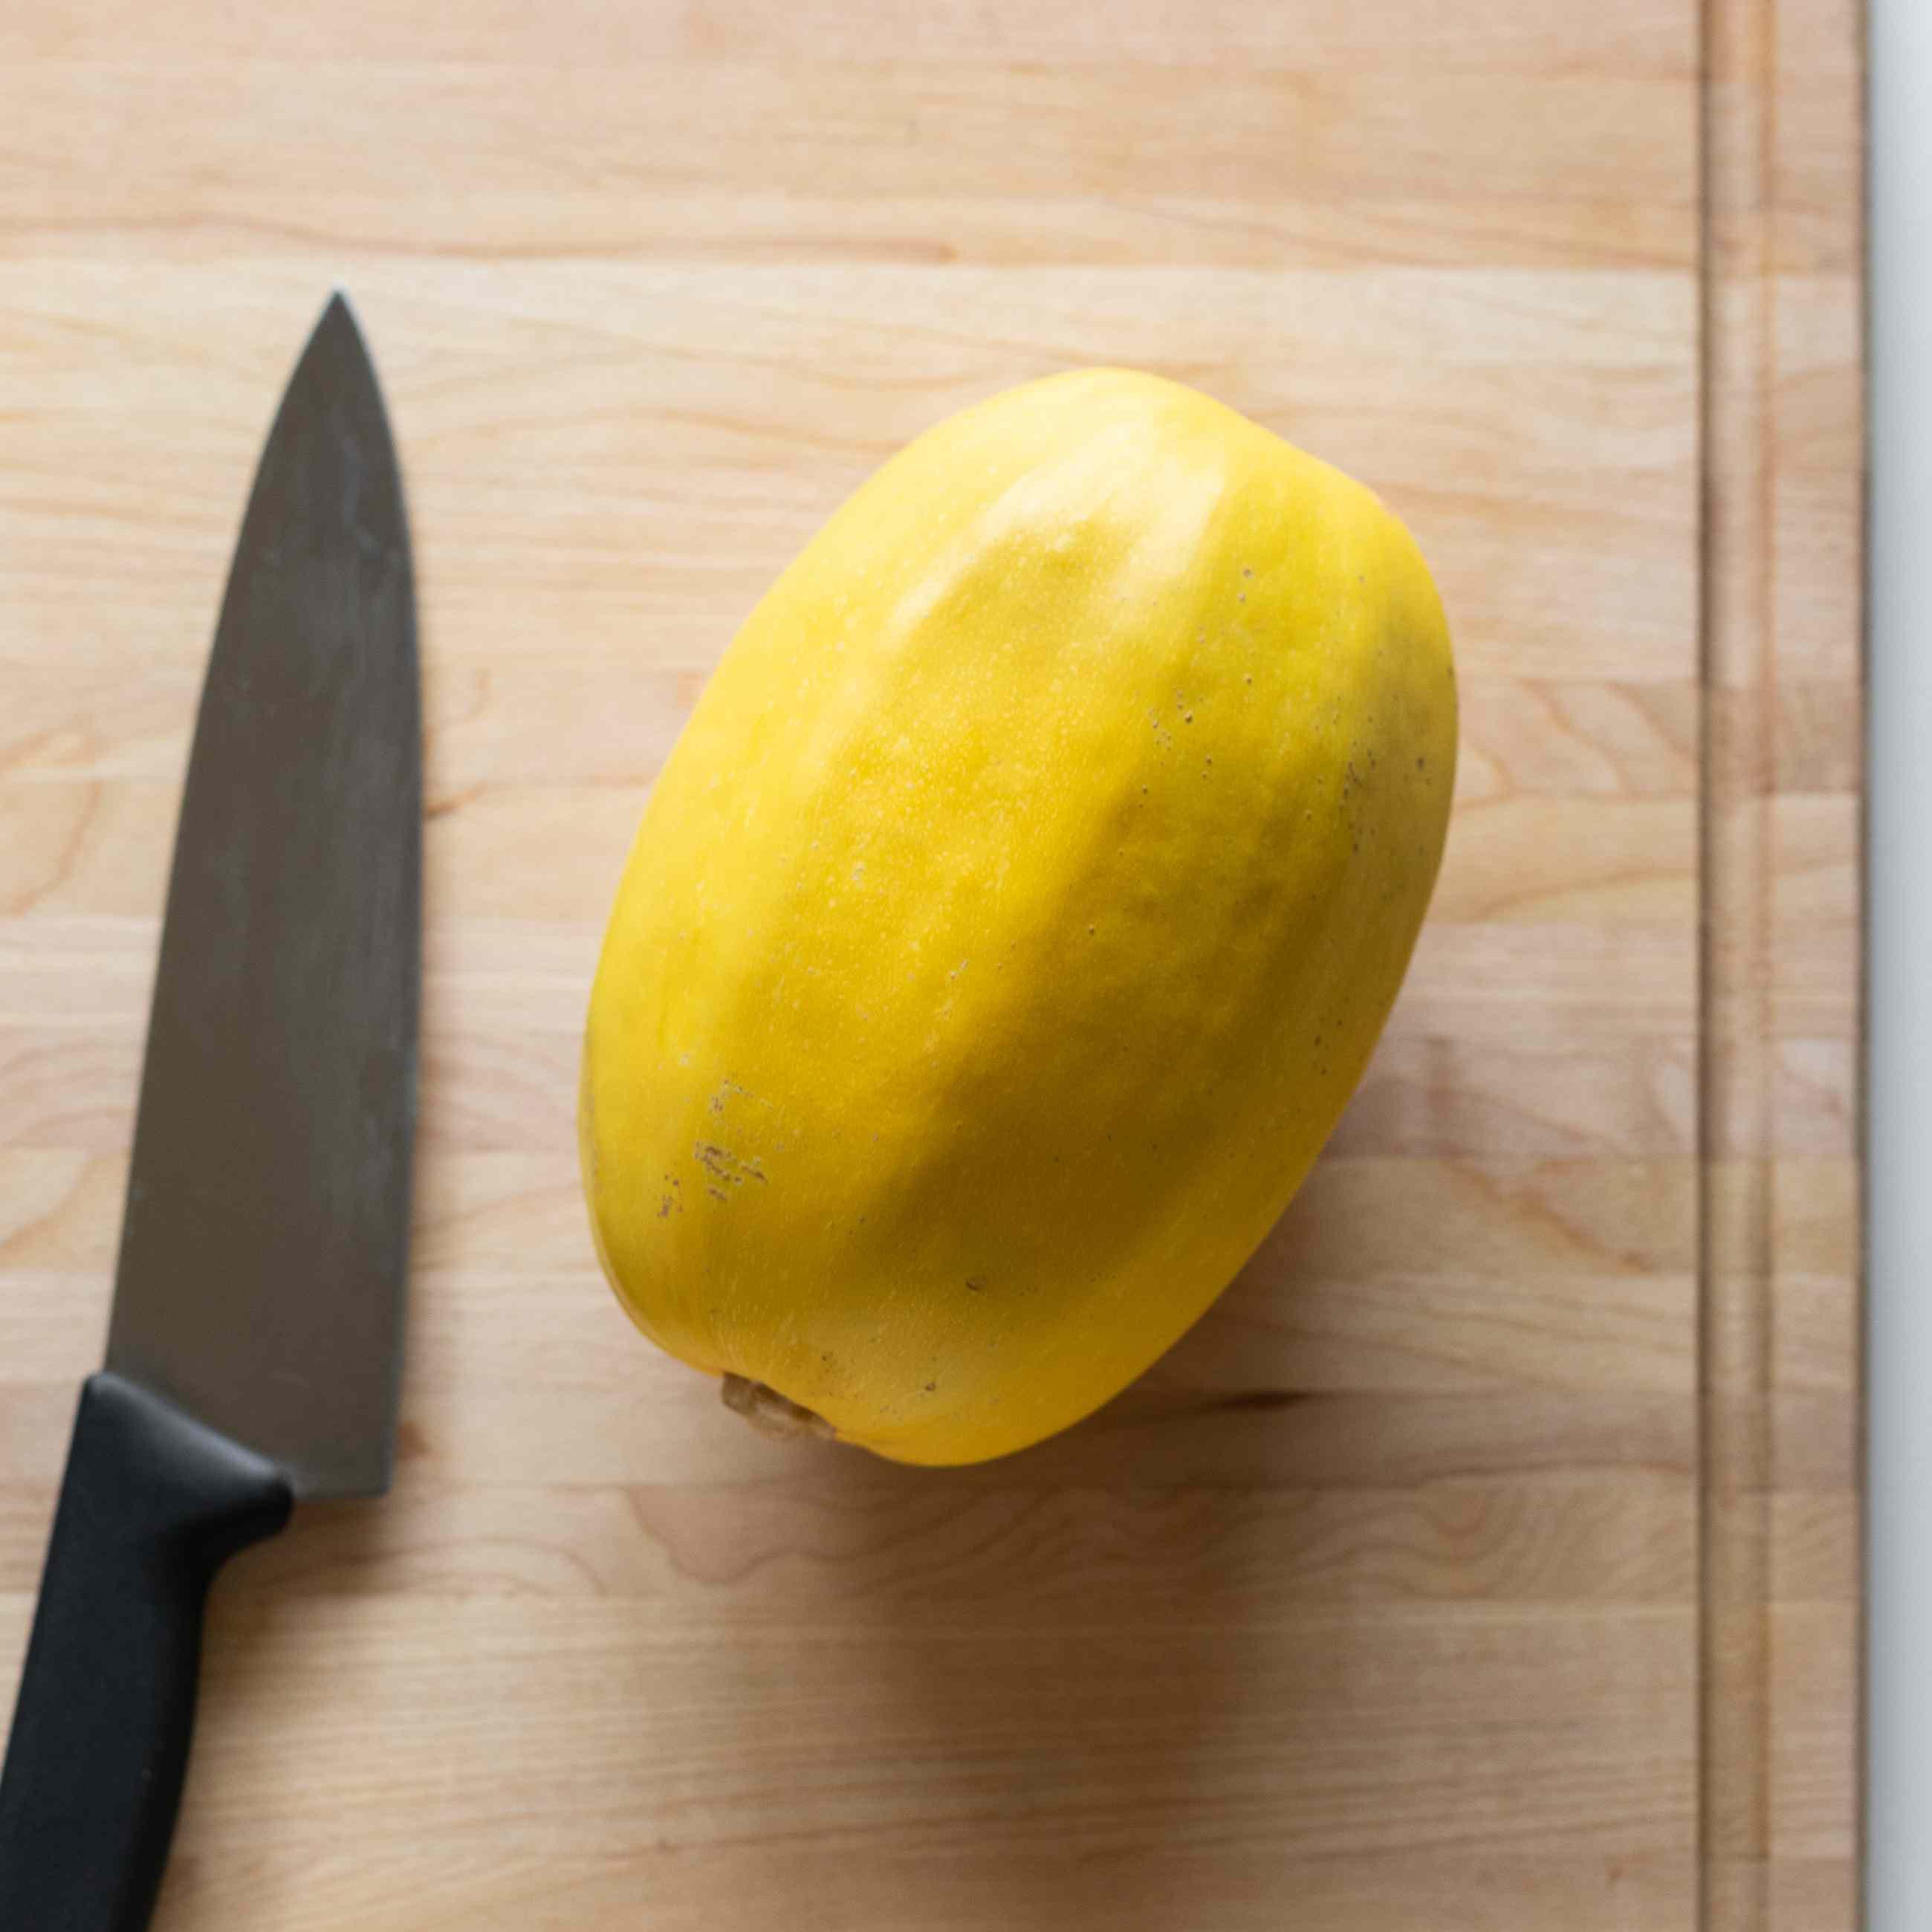 Whole spaghetti squash and chef's knife on wood cutting board